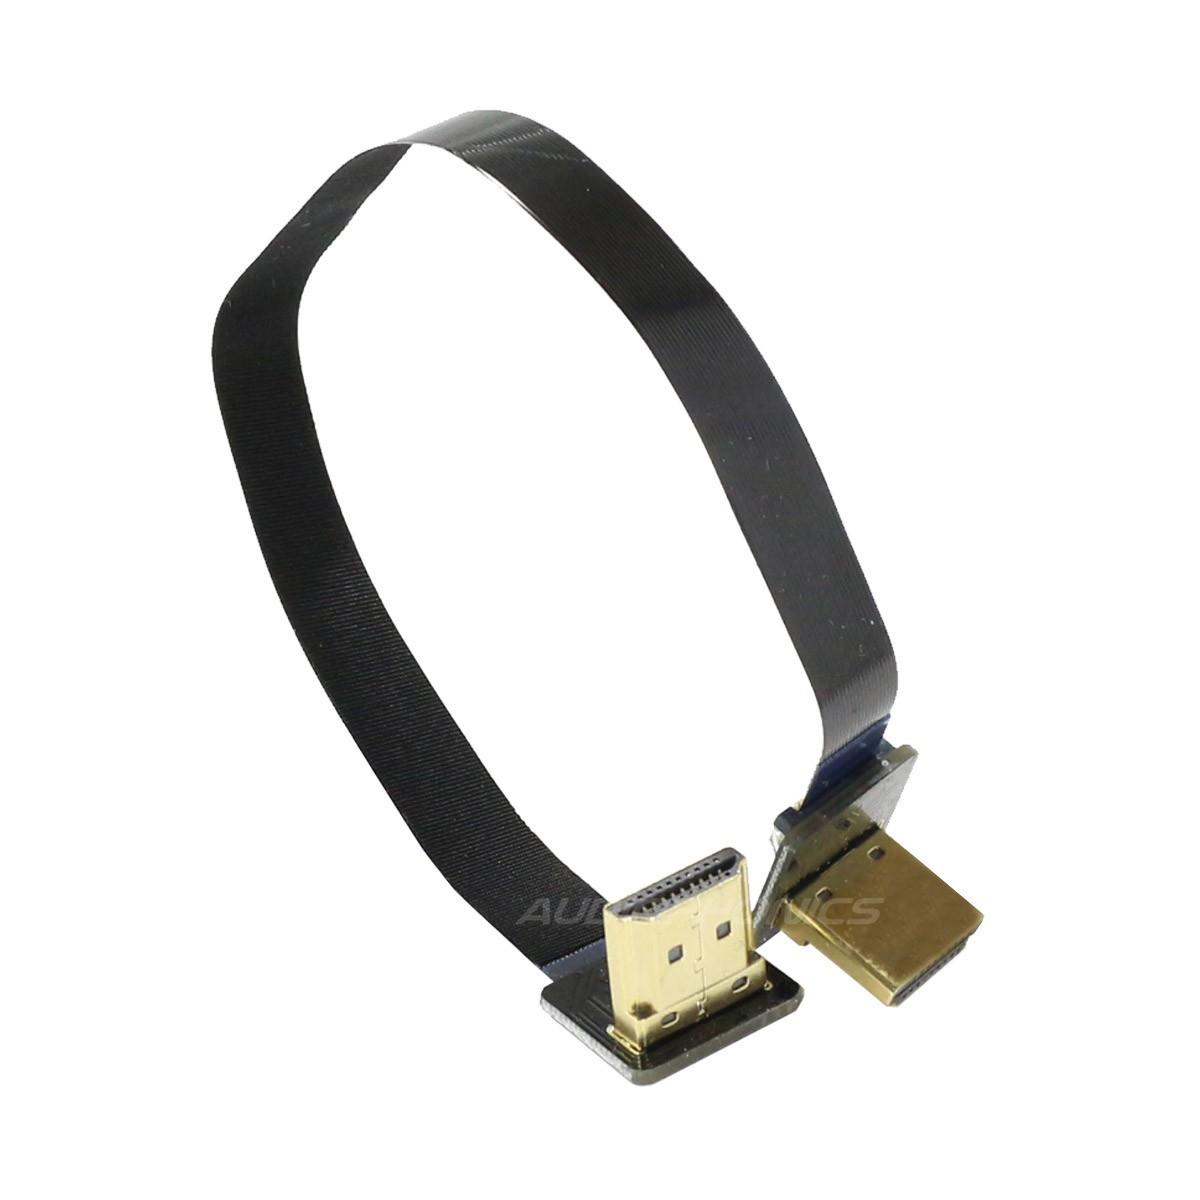 Câble Nappe HDMI-A Mâle / Mâle Coudé 90° 20cm